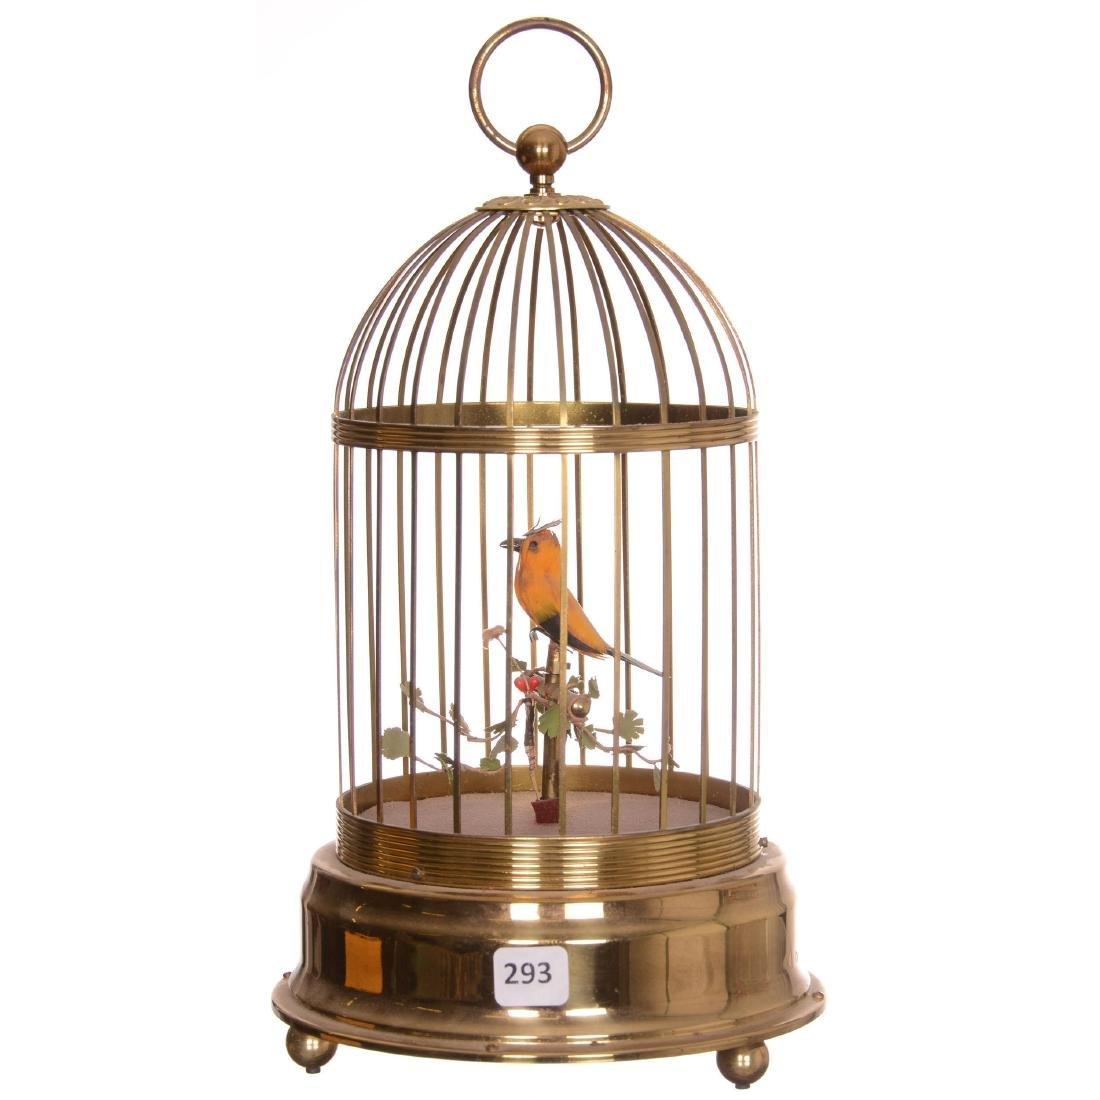 German Wind-Up Musical Bird Cage